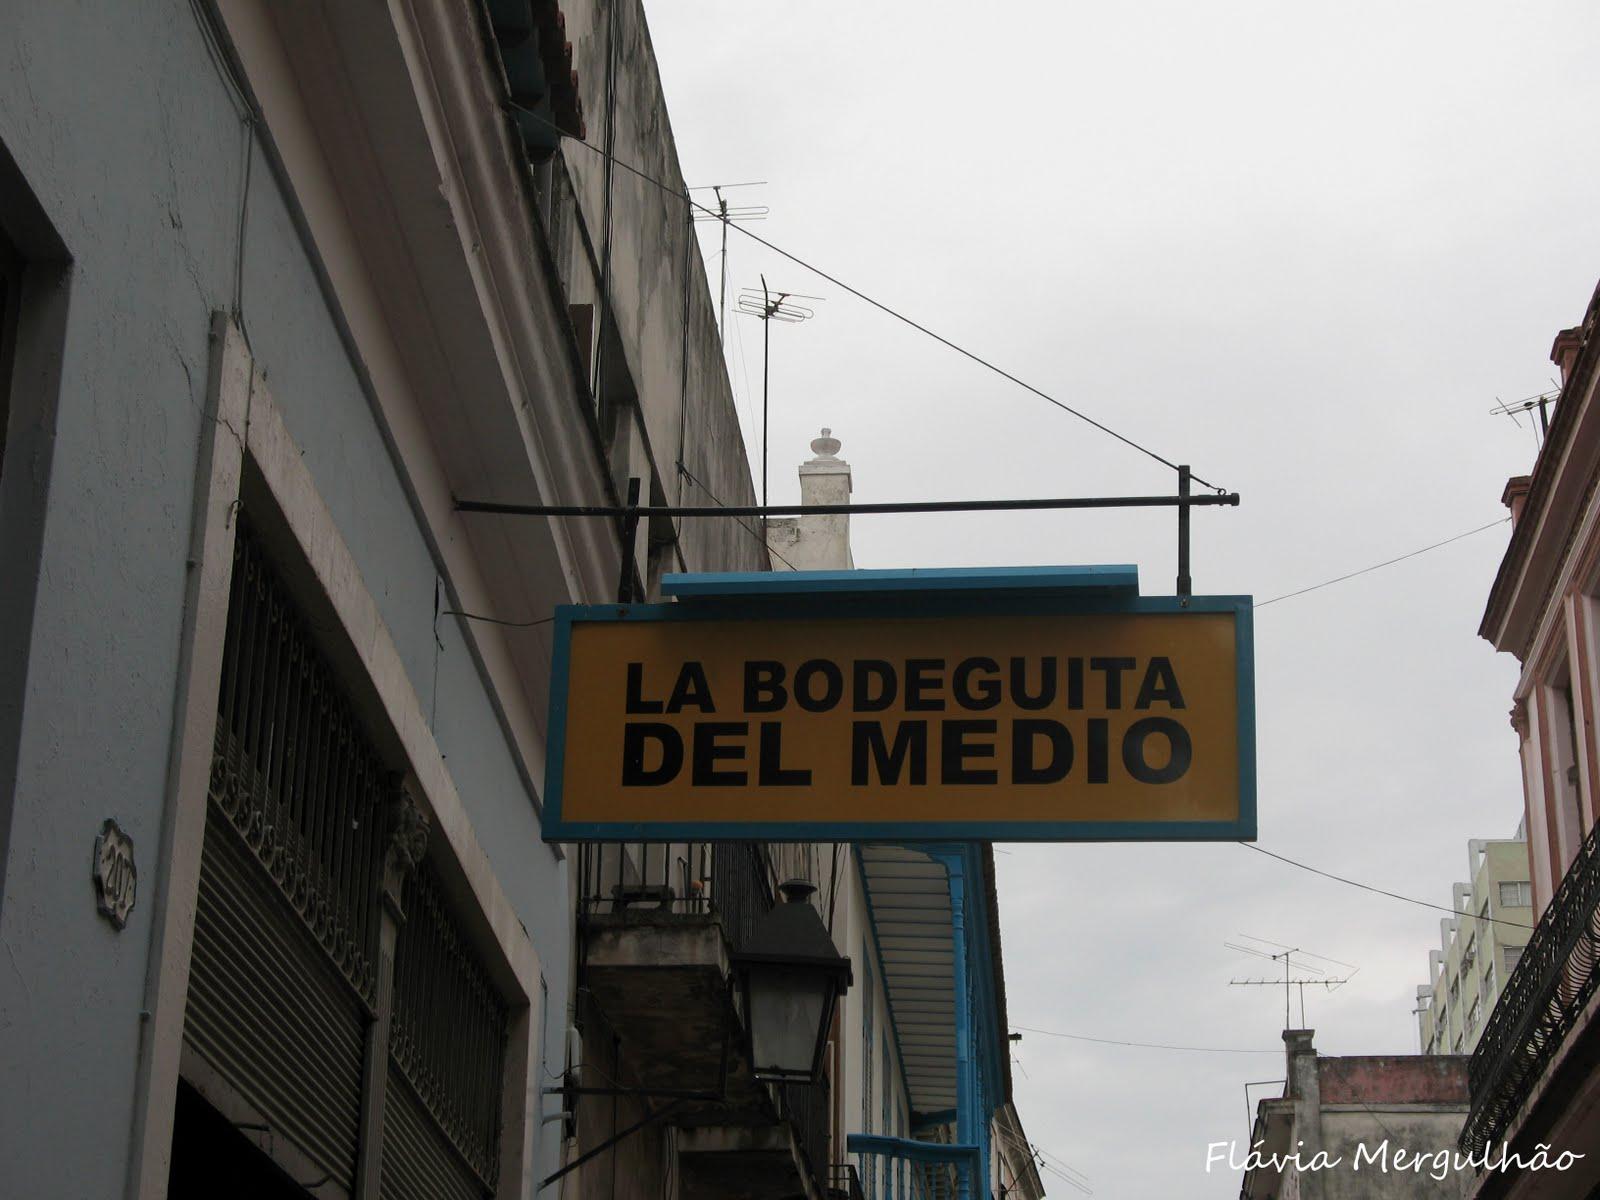 Cuba - Havana, Trinidad e Santa Clara : Cuba - Relatos de Viagem